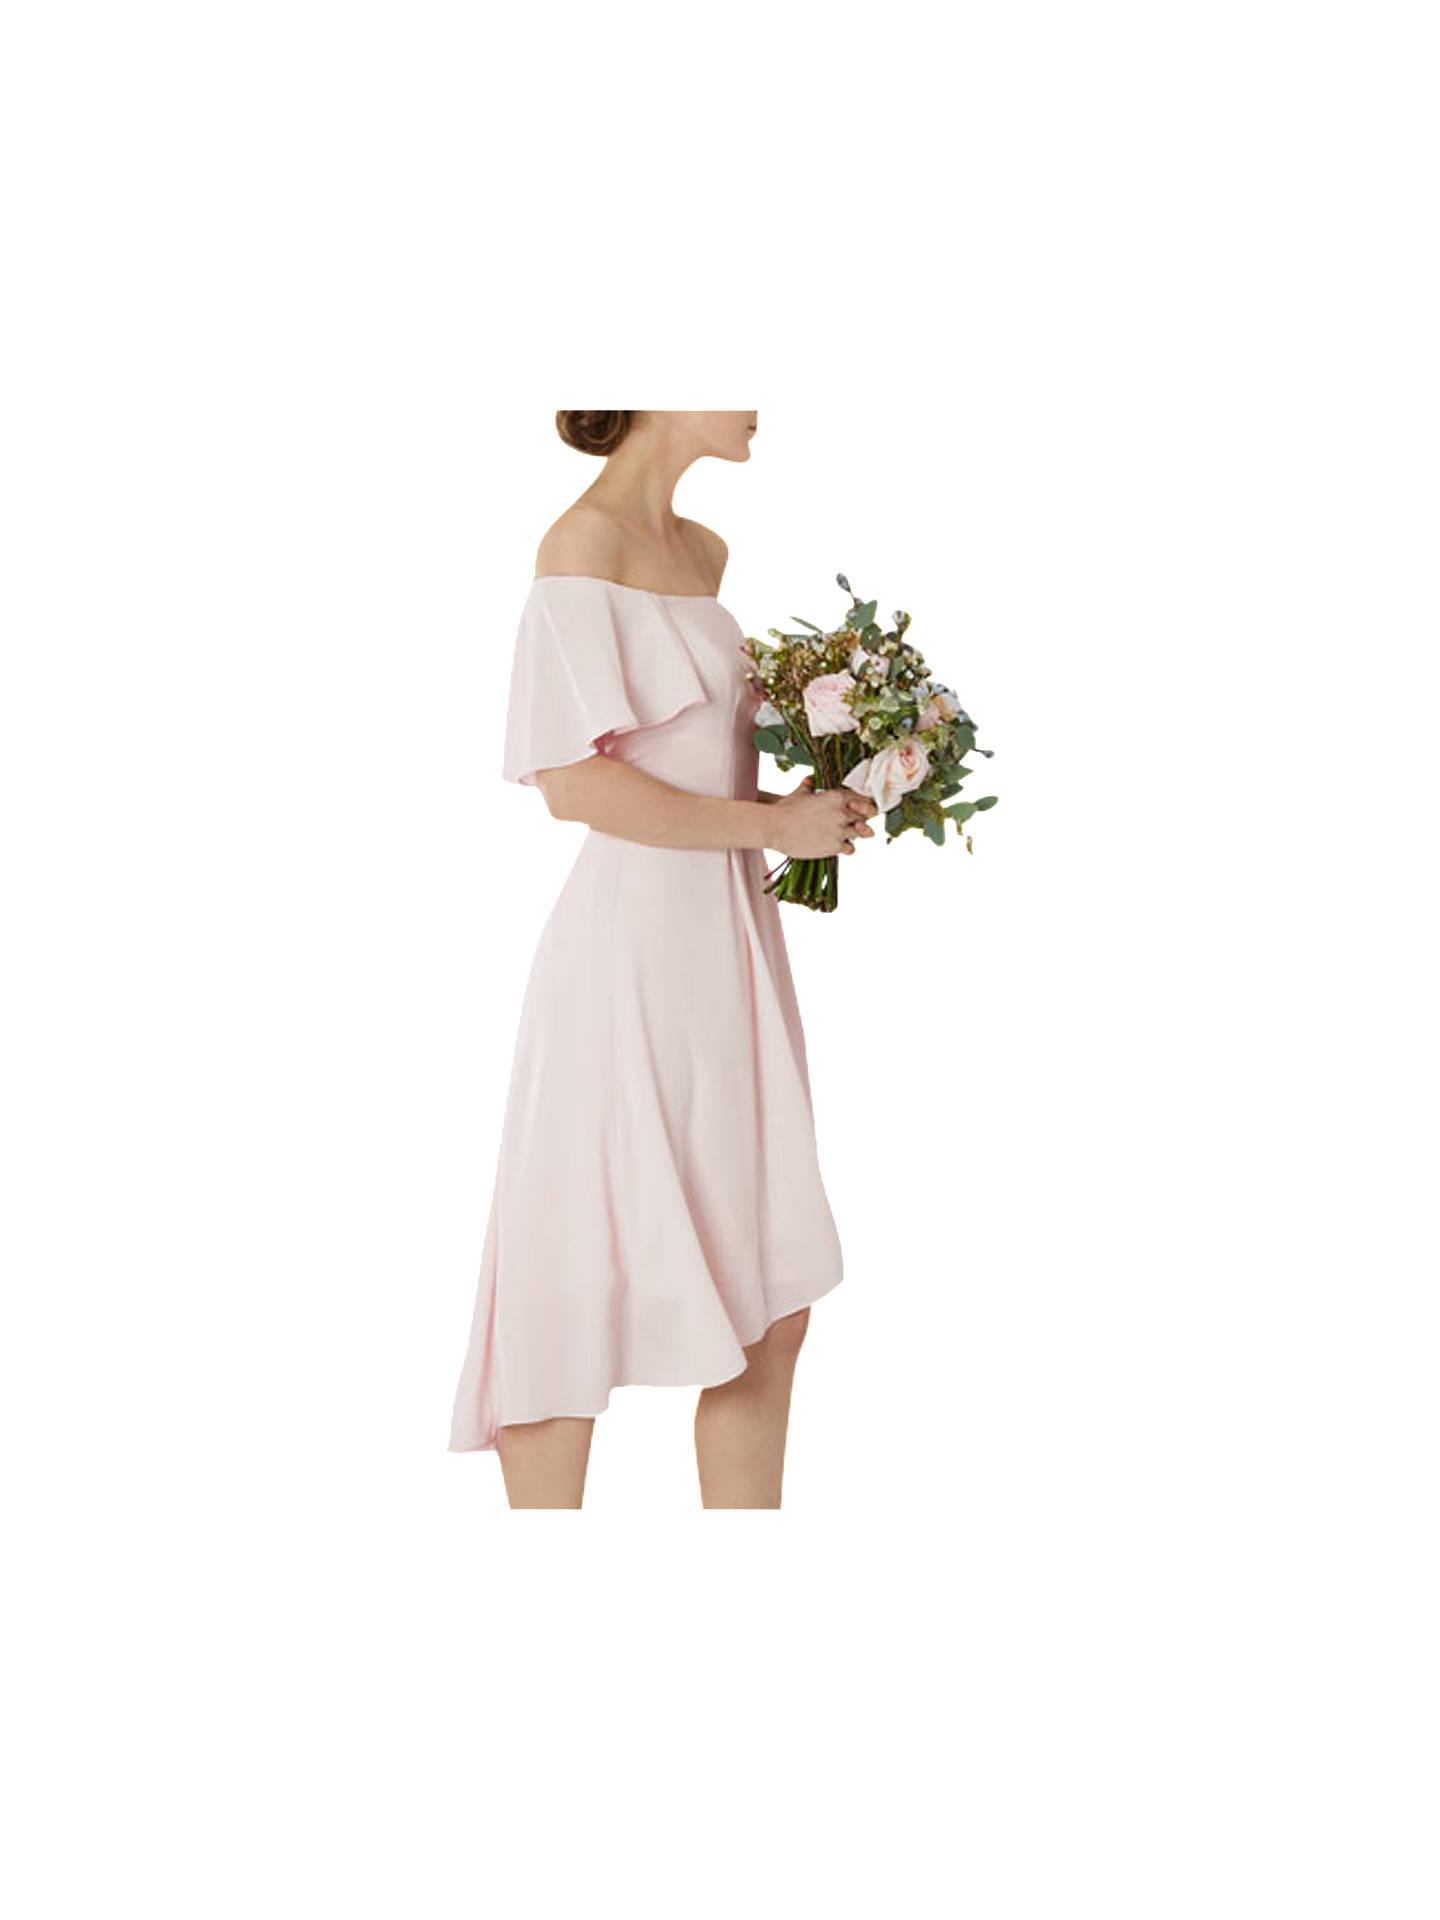 538f69dbf487 ... Buy Coast Betty Midi Dress, Blush, 6 Online at johnlewis.com ...